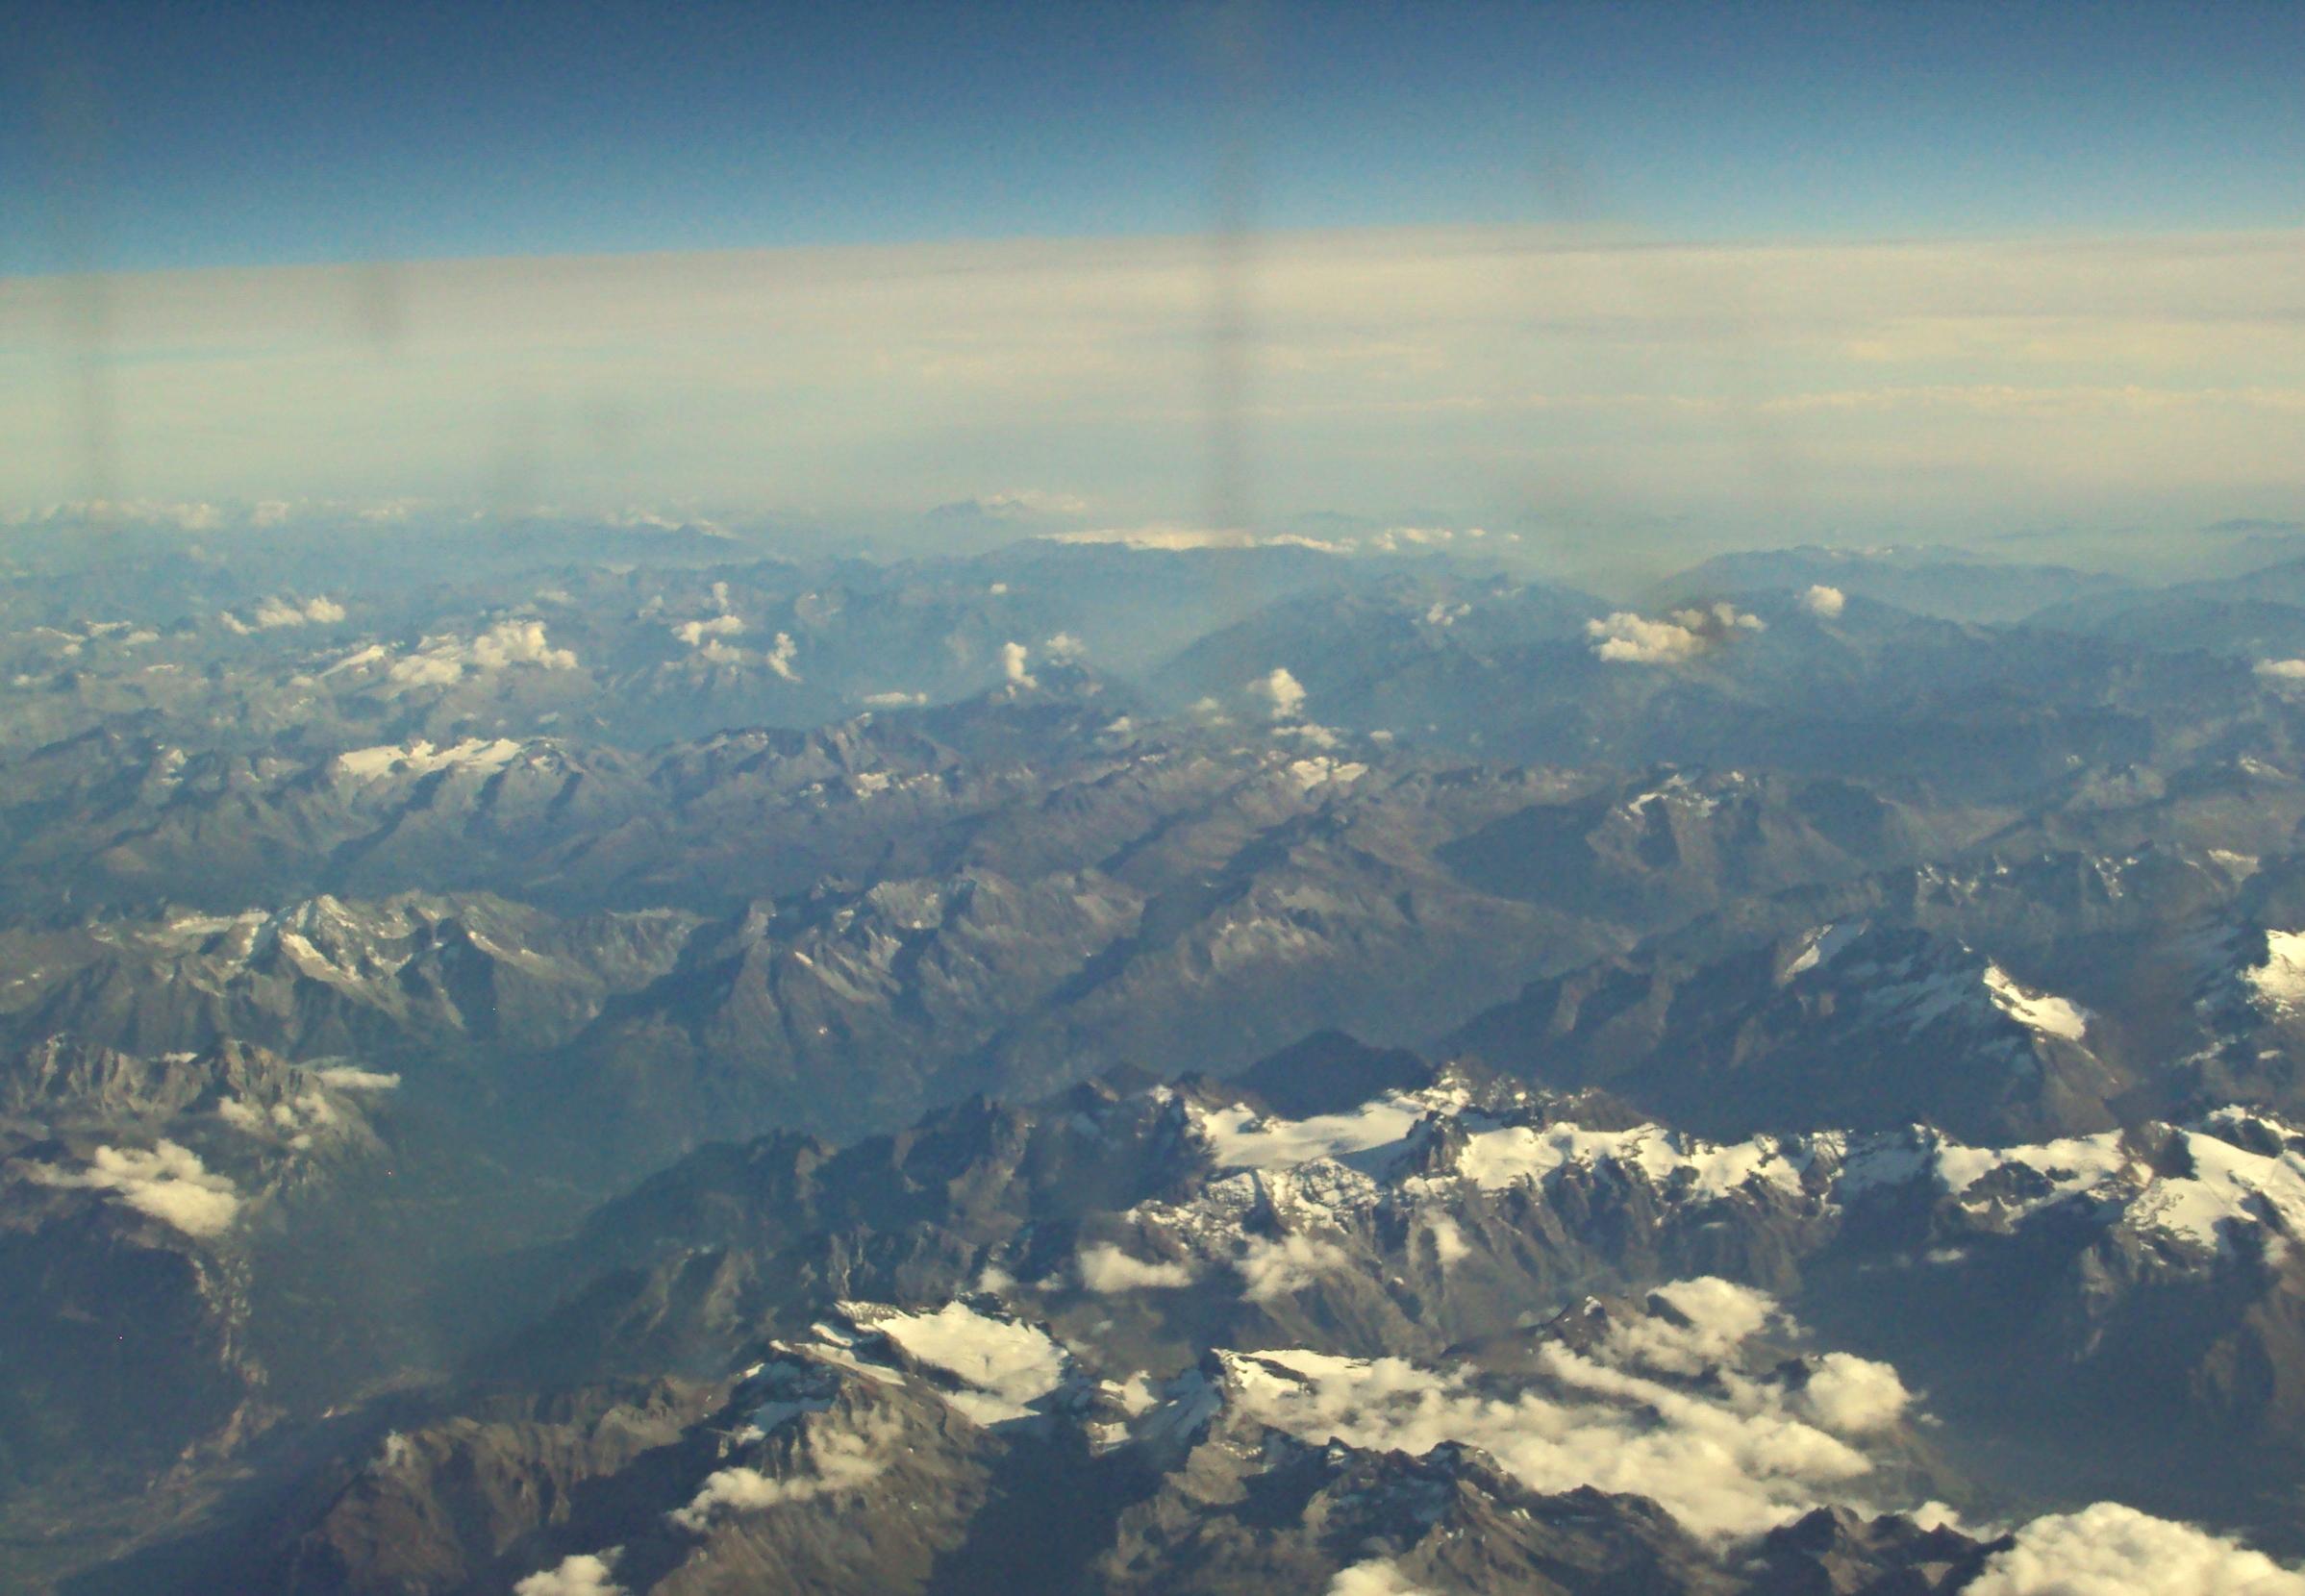 Views from a very sketchy ryan air flight.